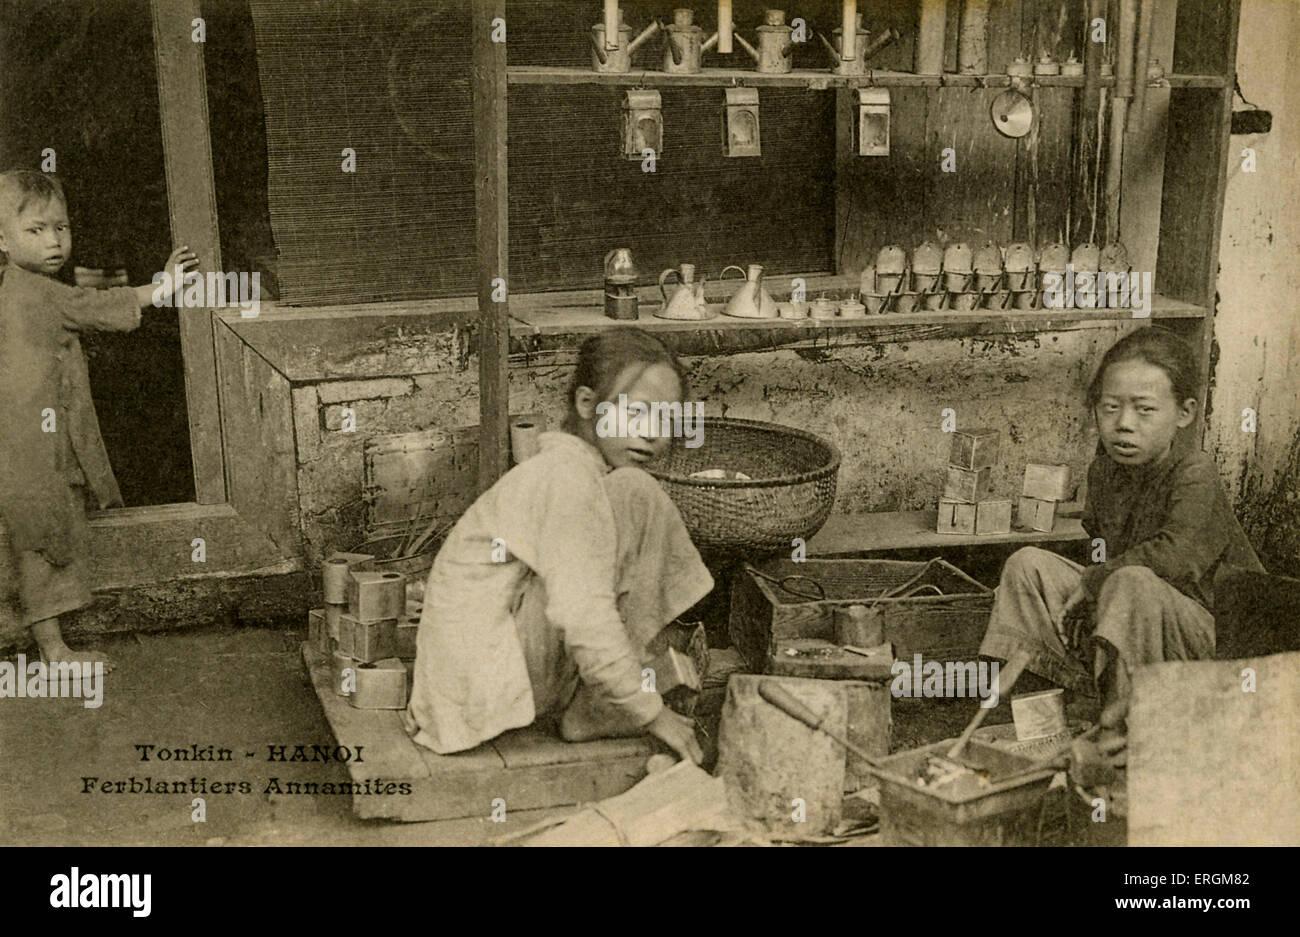 Child tinplate workes/ tinkers/  tinsmiths, Hanoi, Tonkin, north Vietnam. Postcard after photograph, 20th century. - Stock Image